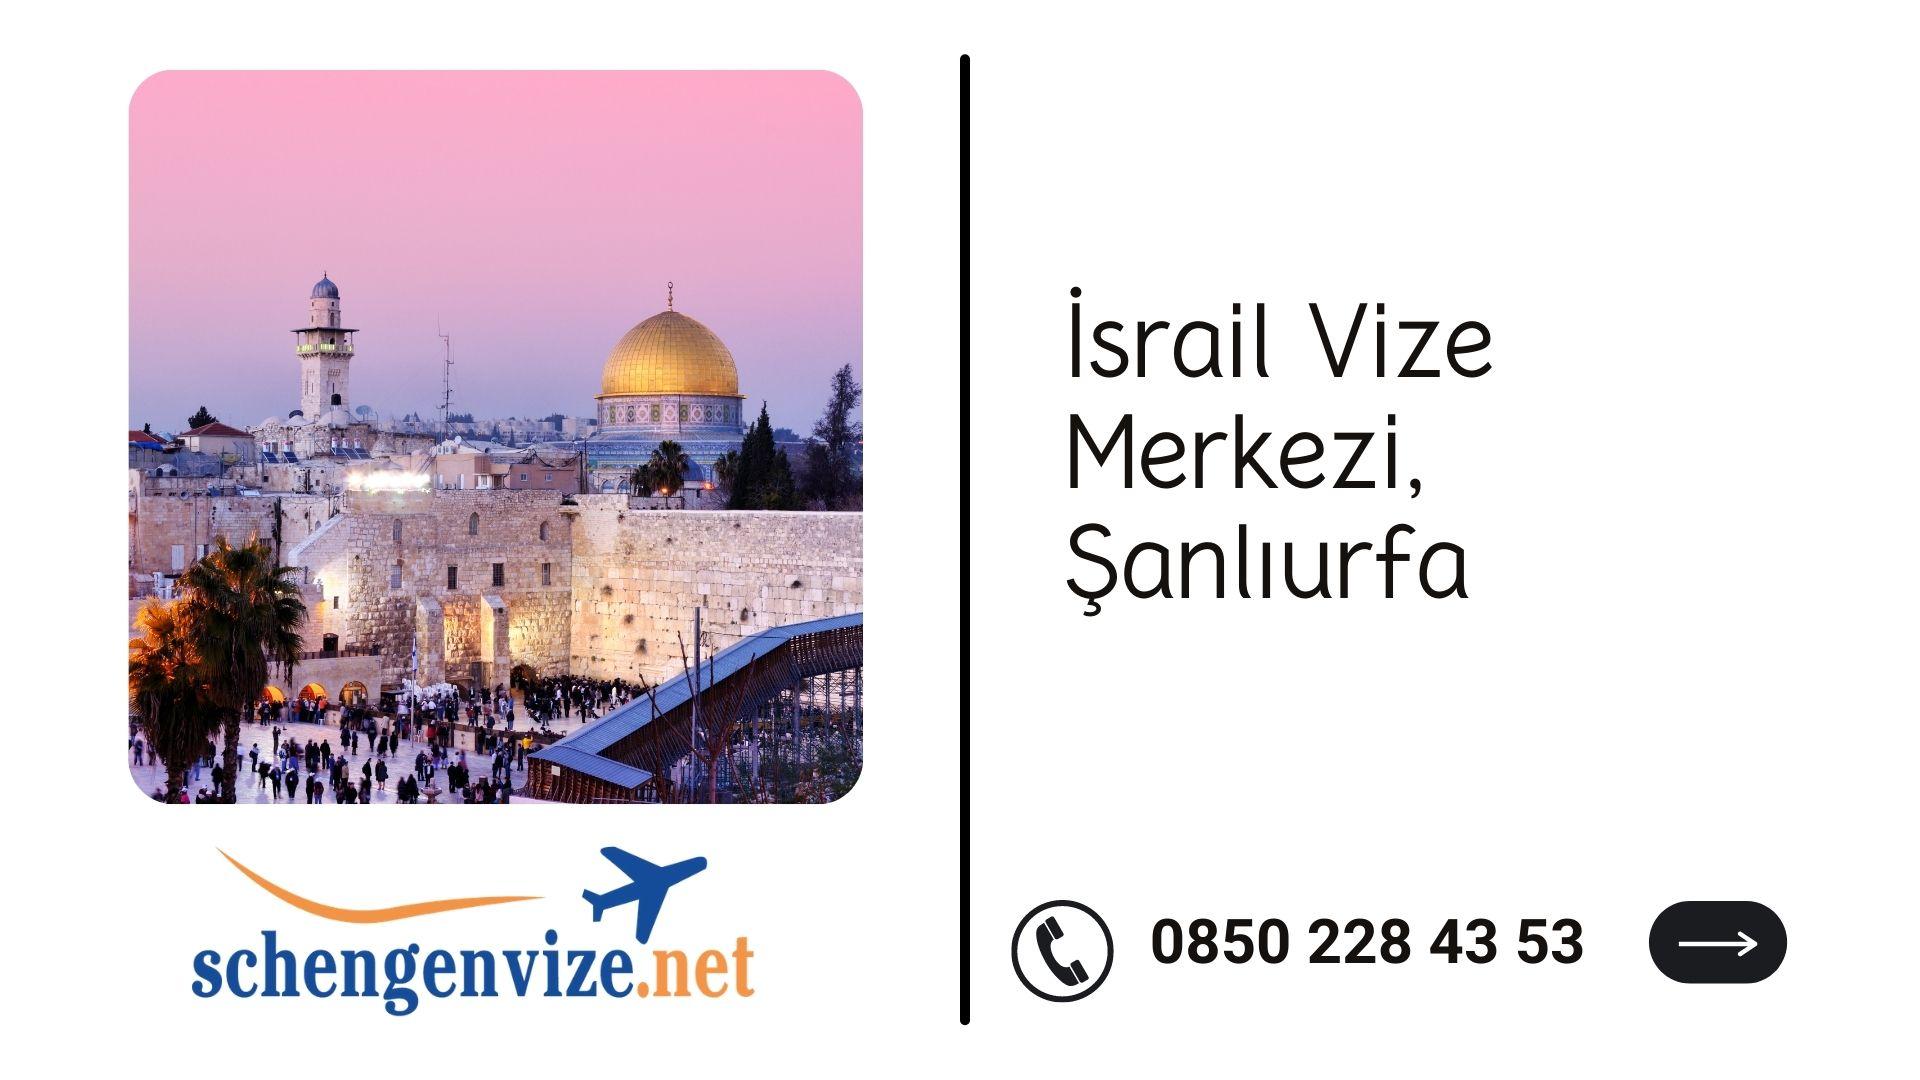 İsrail Vize Merkezi, Şanlıurfa